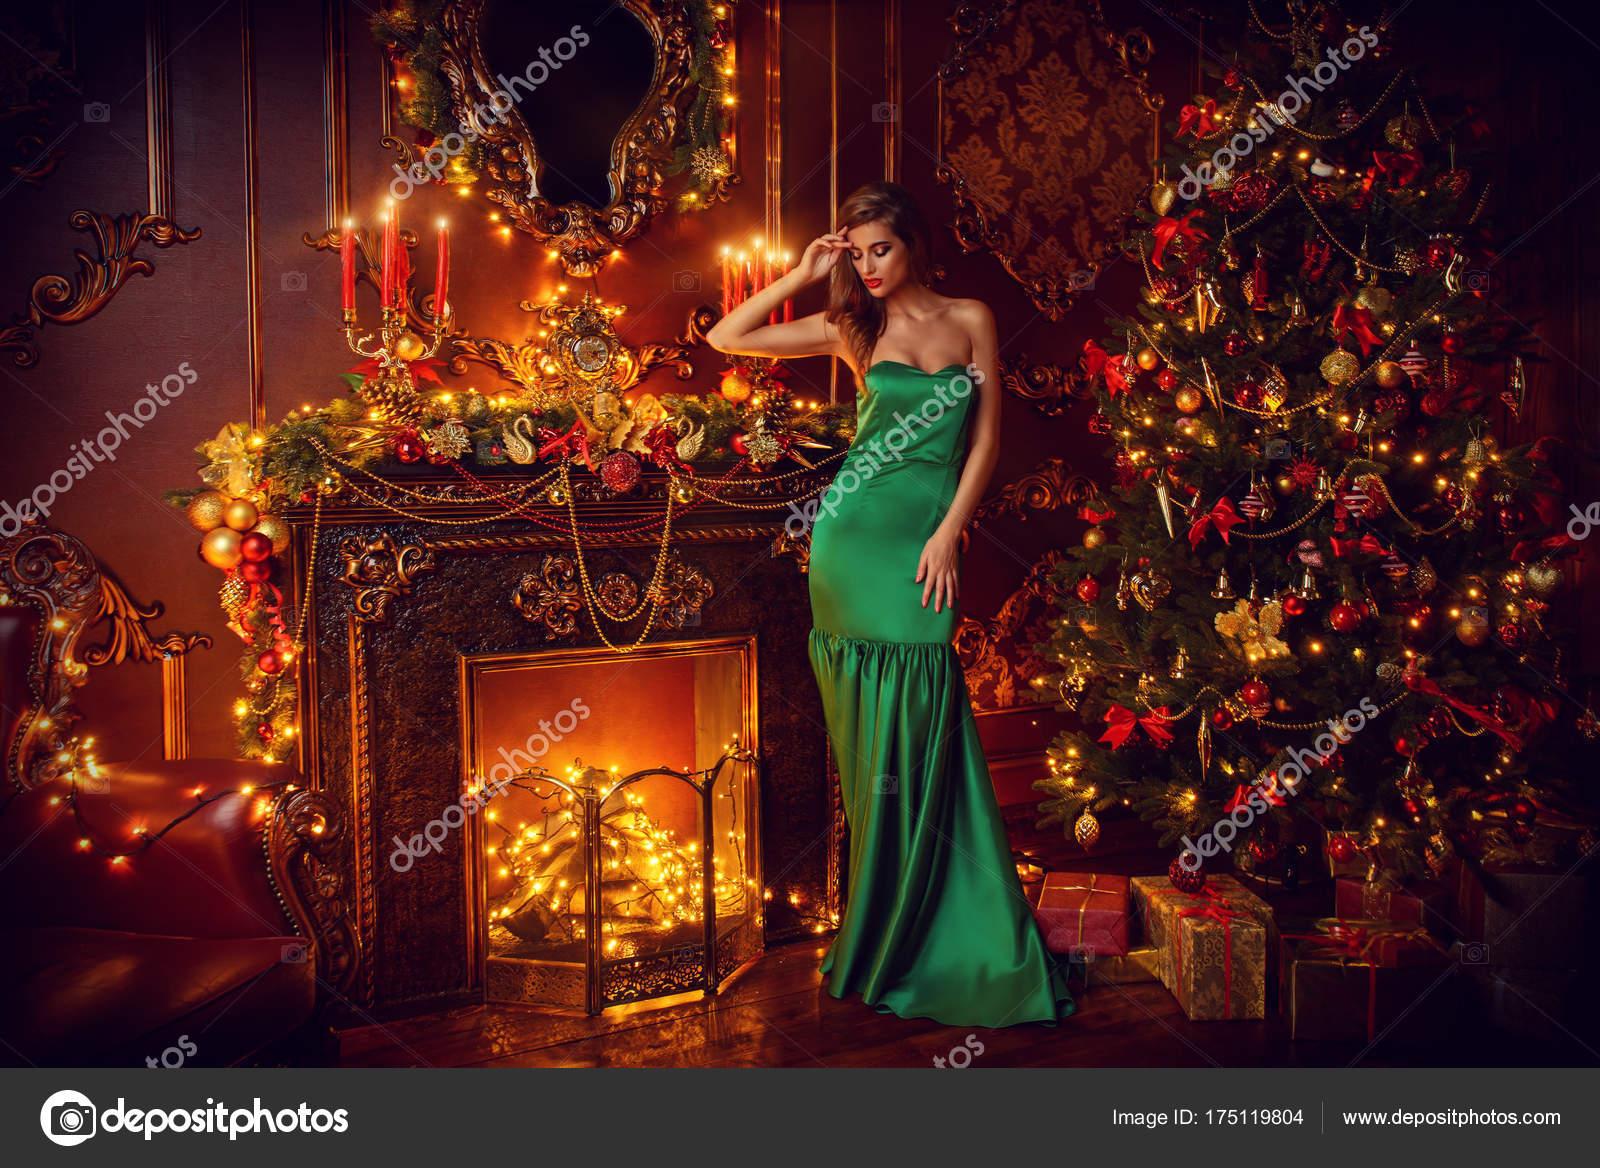 sexy Frau Kaminfeuer — Stockfoto © prometeus #175119804